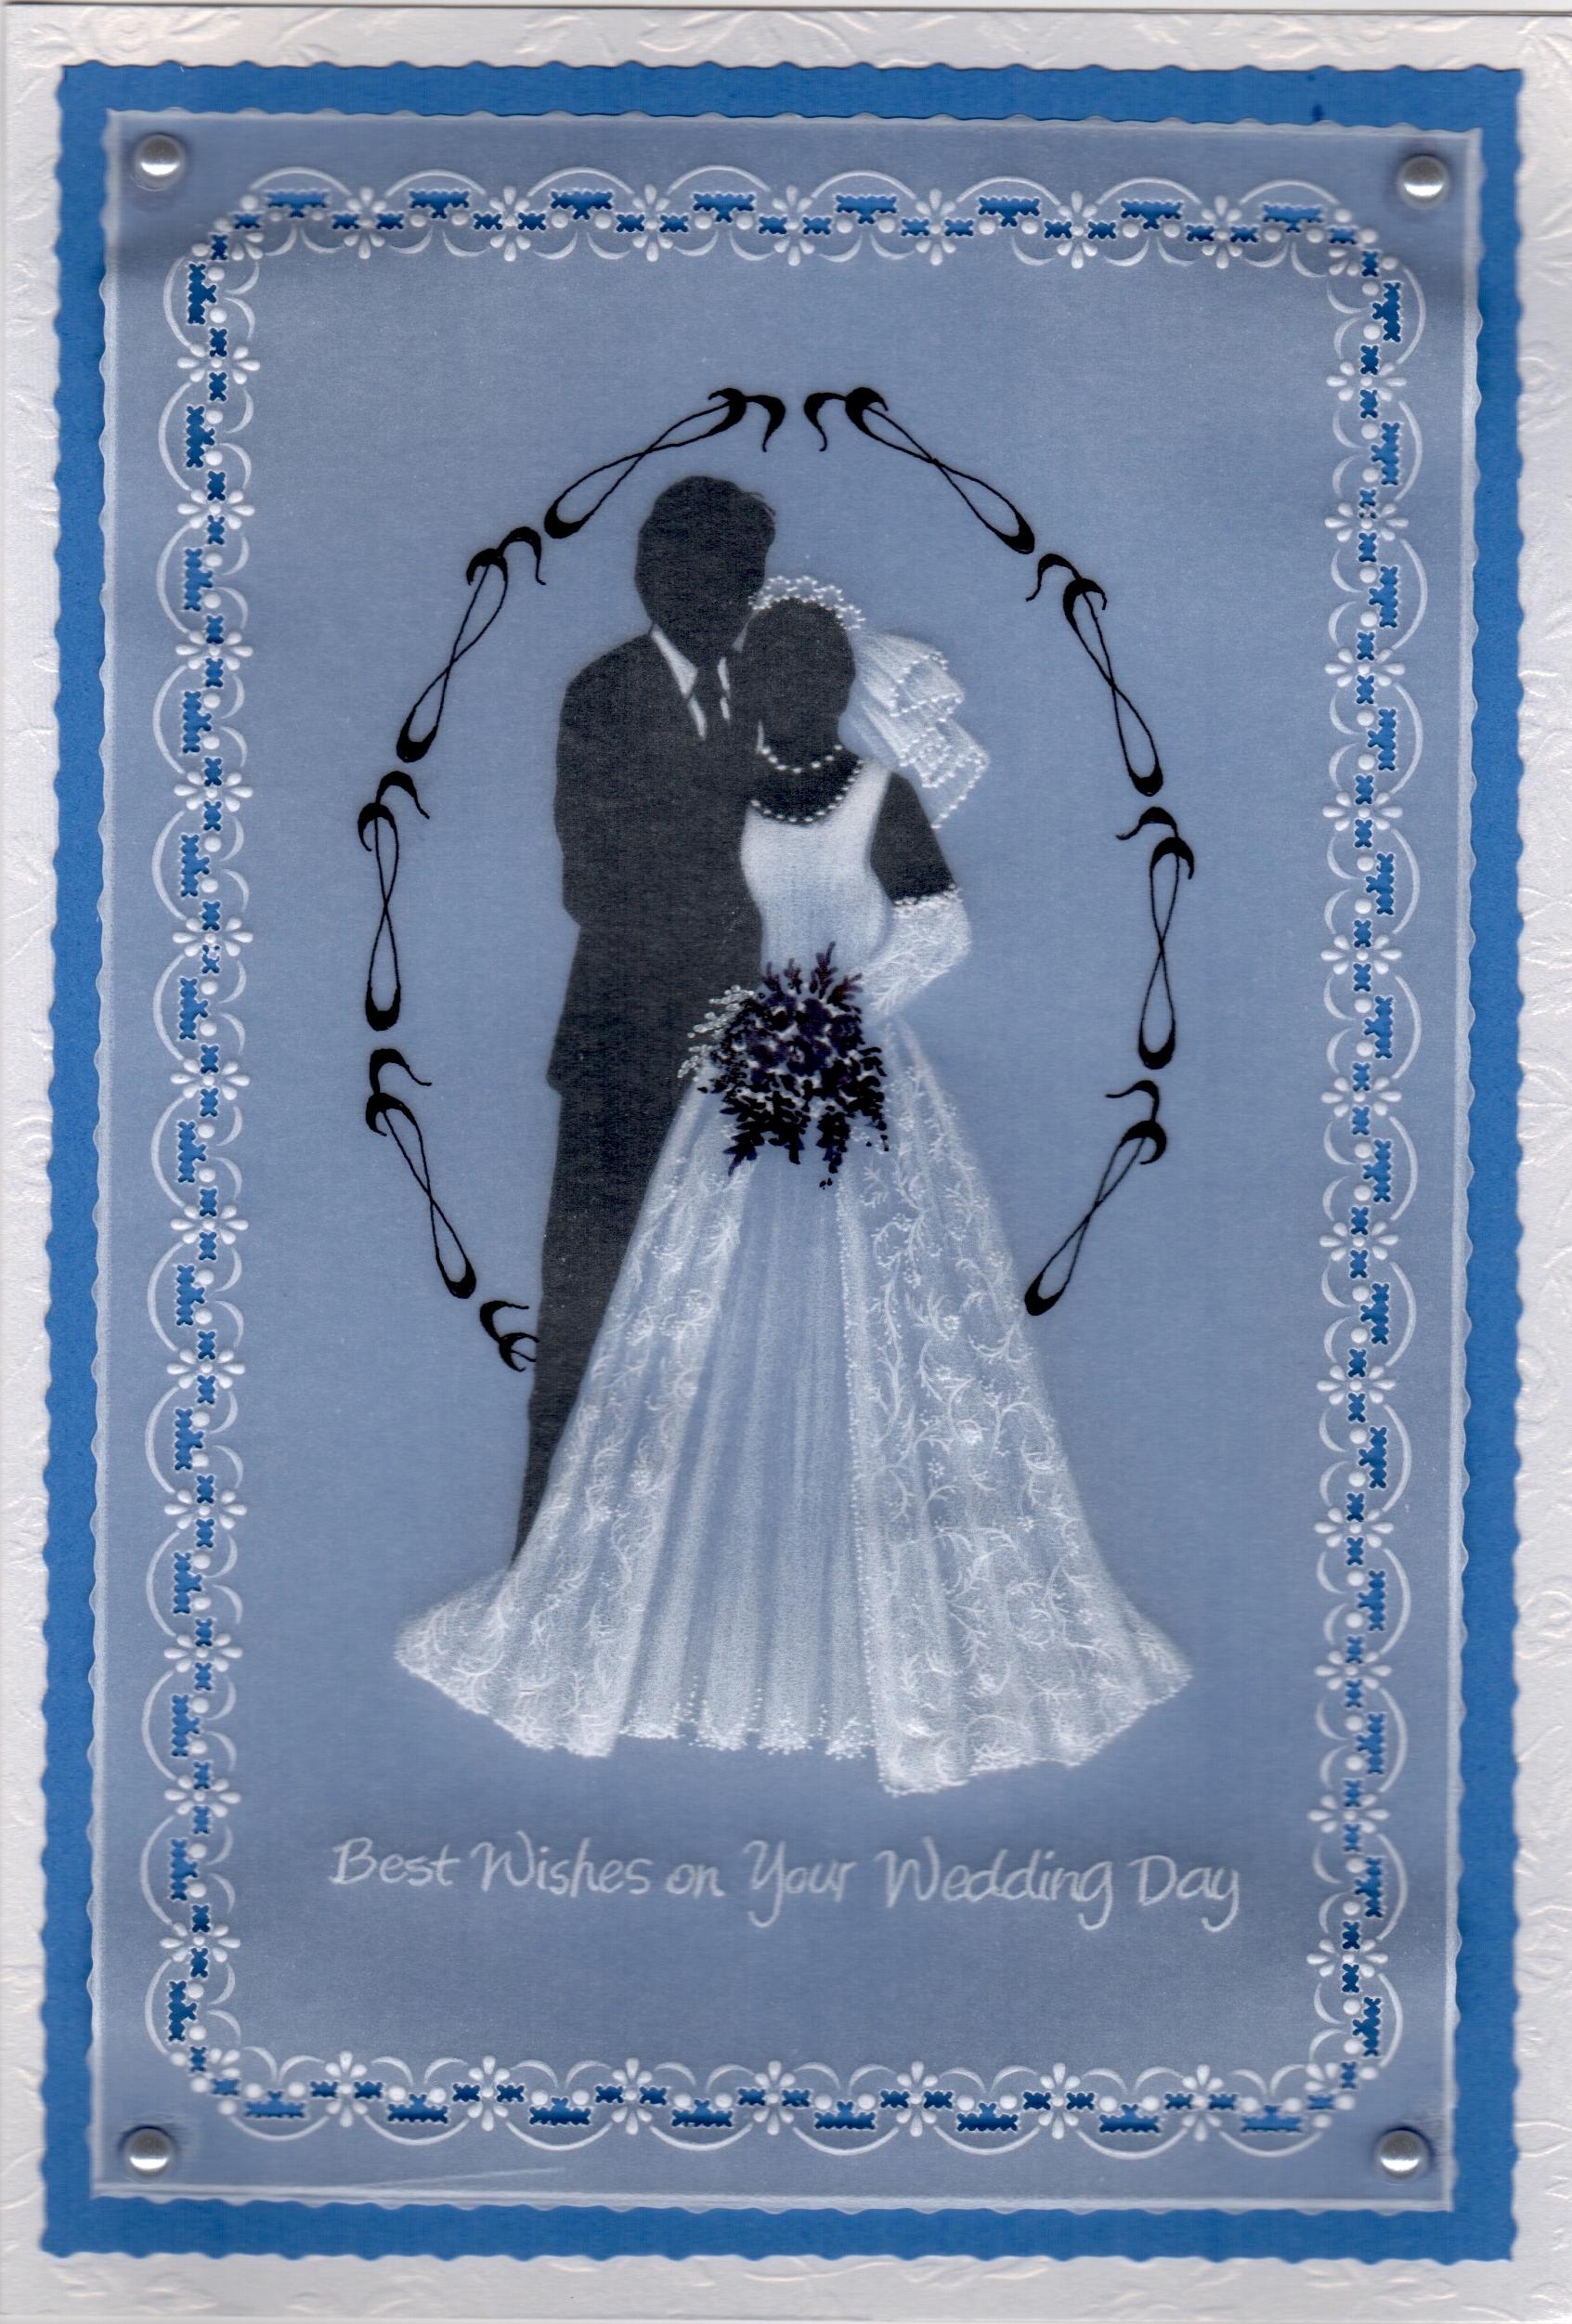 BEAUTIFUL 3D BRIDE /& GROOM WEDDING DAY CARD TOPPER